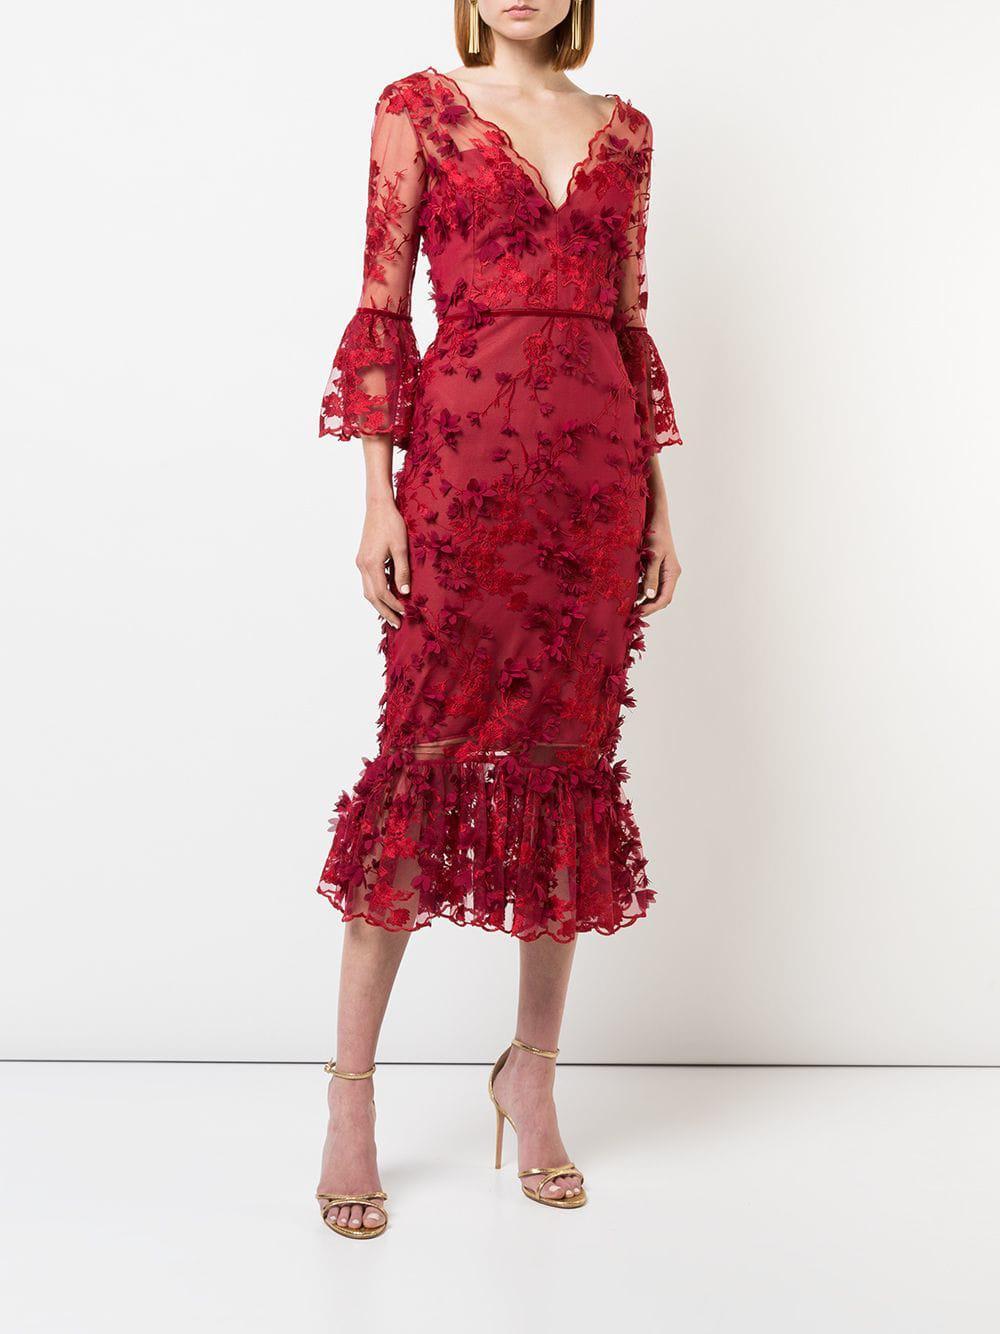 65de74153df Marchesa notte - 3 4 Sleeve Embroidered Midi Dress - Lyst. View fullscreen